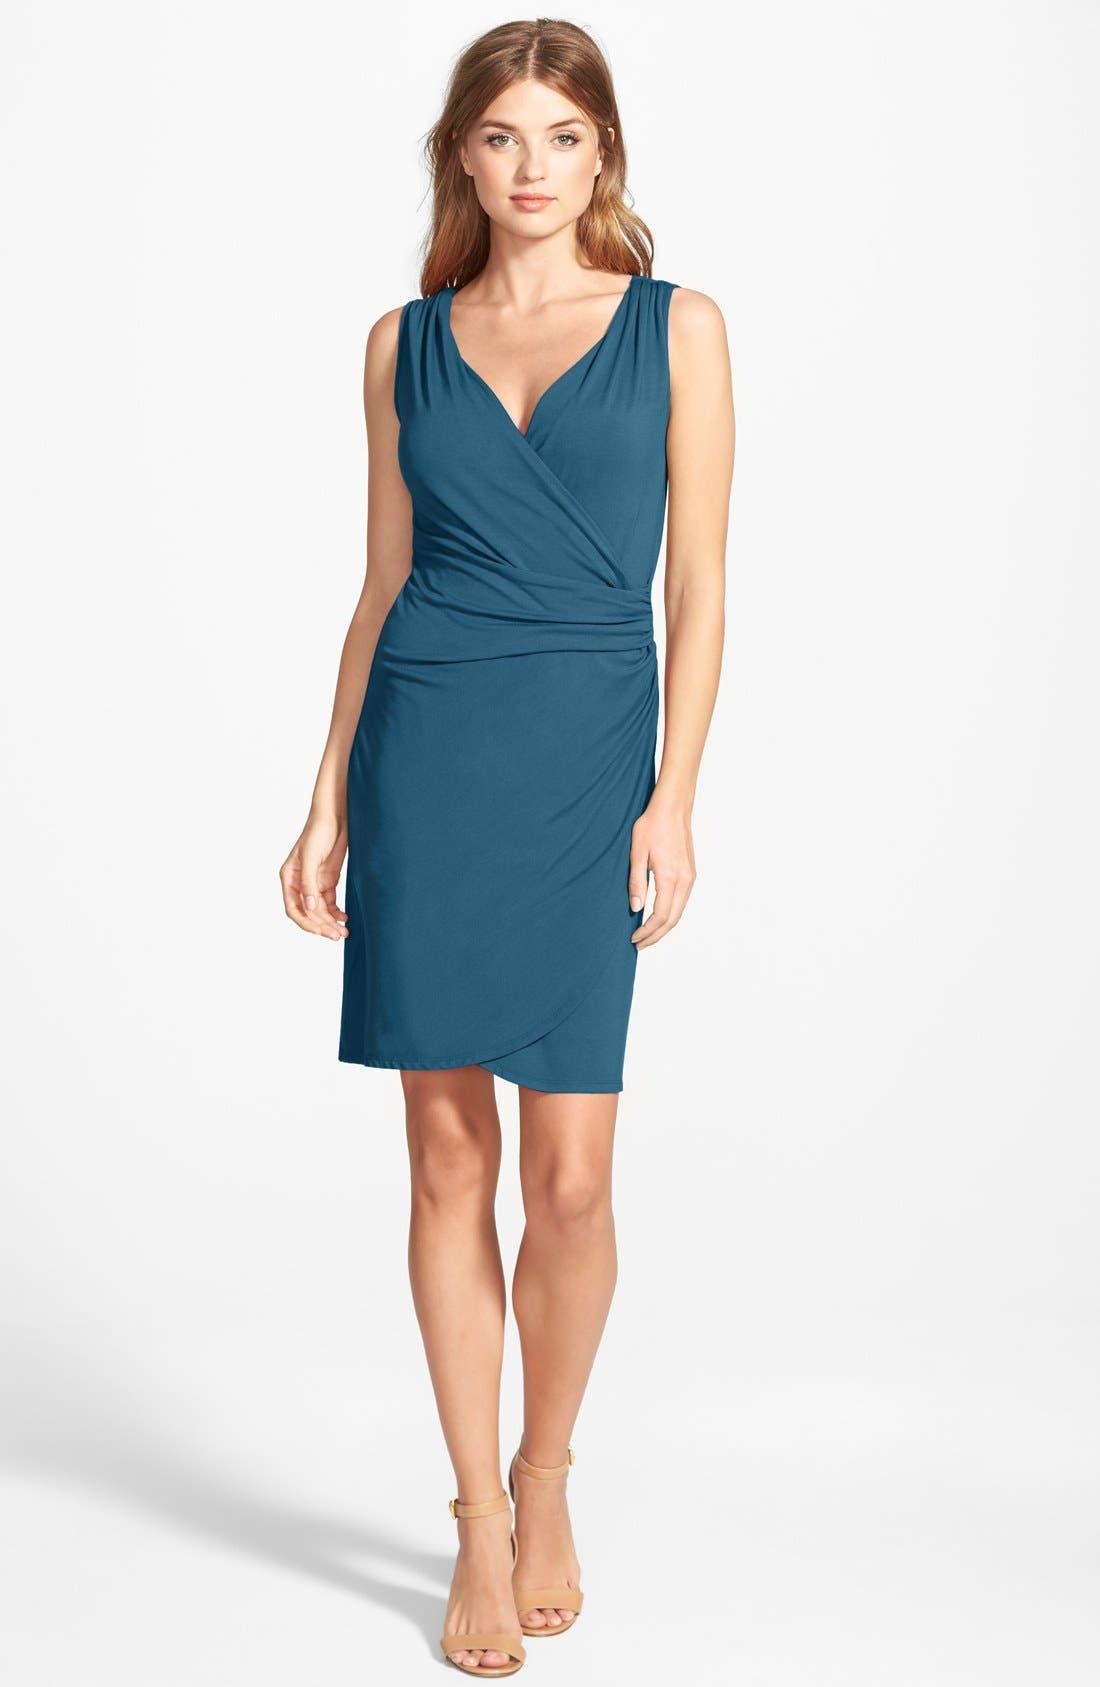 Alternate Image 1 Selected - Tommy Bahama 'Tambour' Sleeveless Gathered Jersey Dress